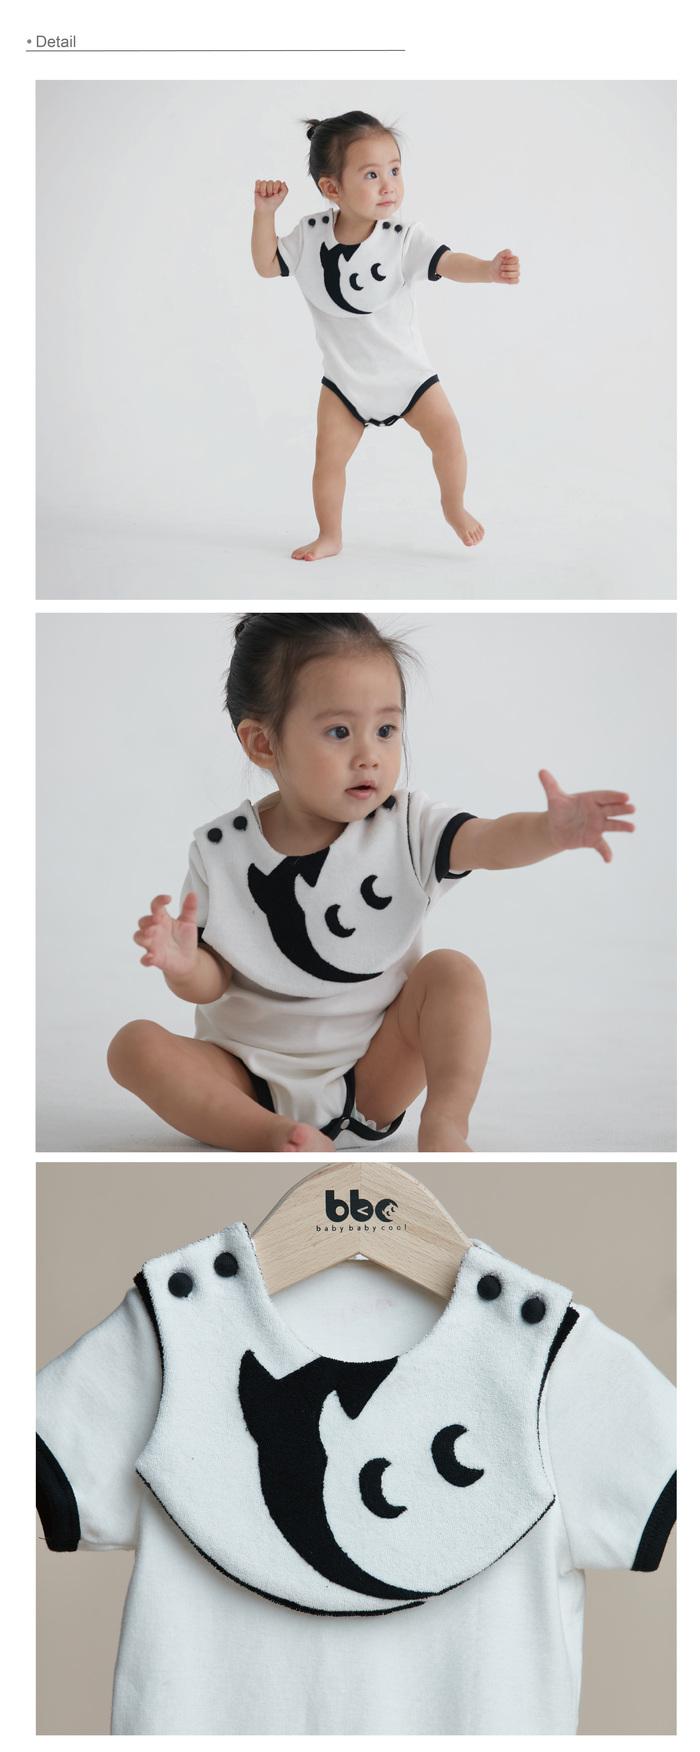 baby baby cool|小精靈雙色圍兜兜包屁衣(黑)